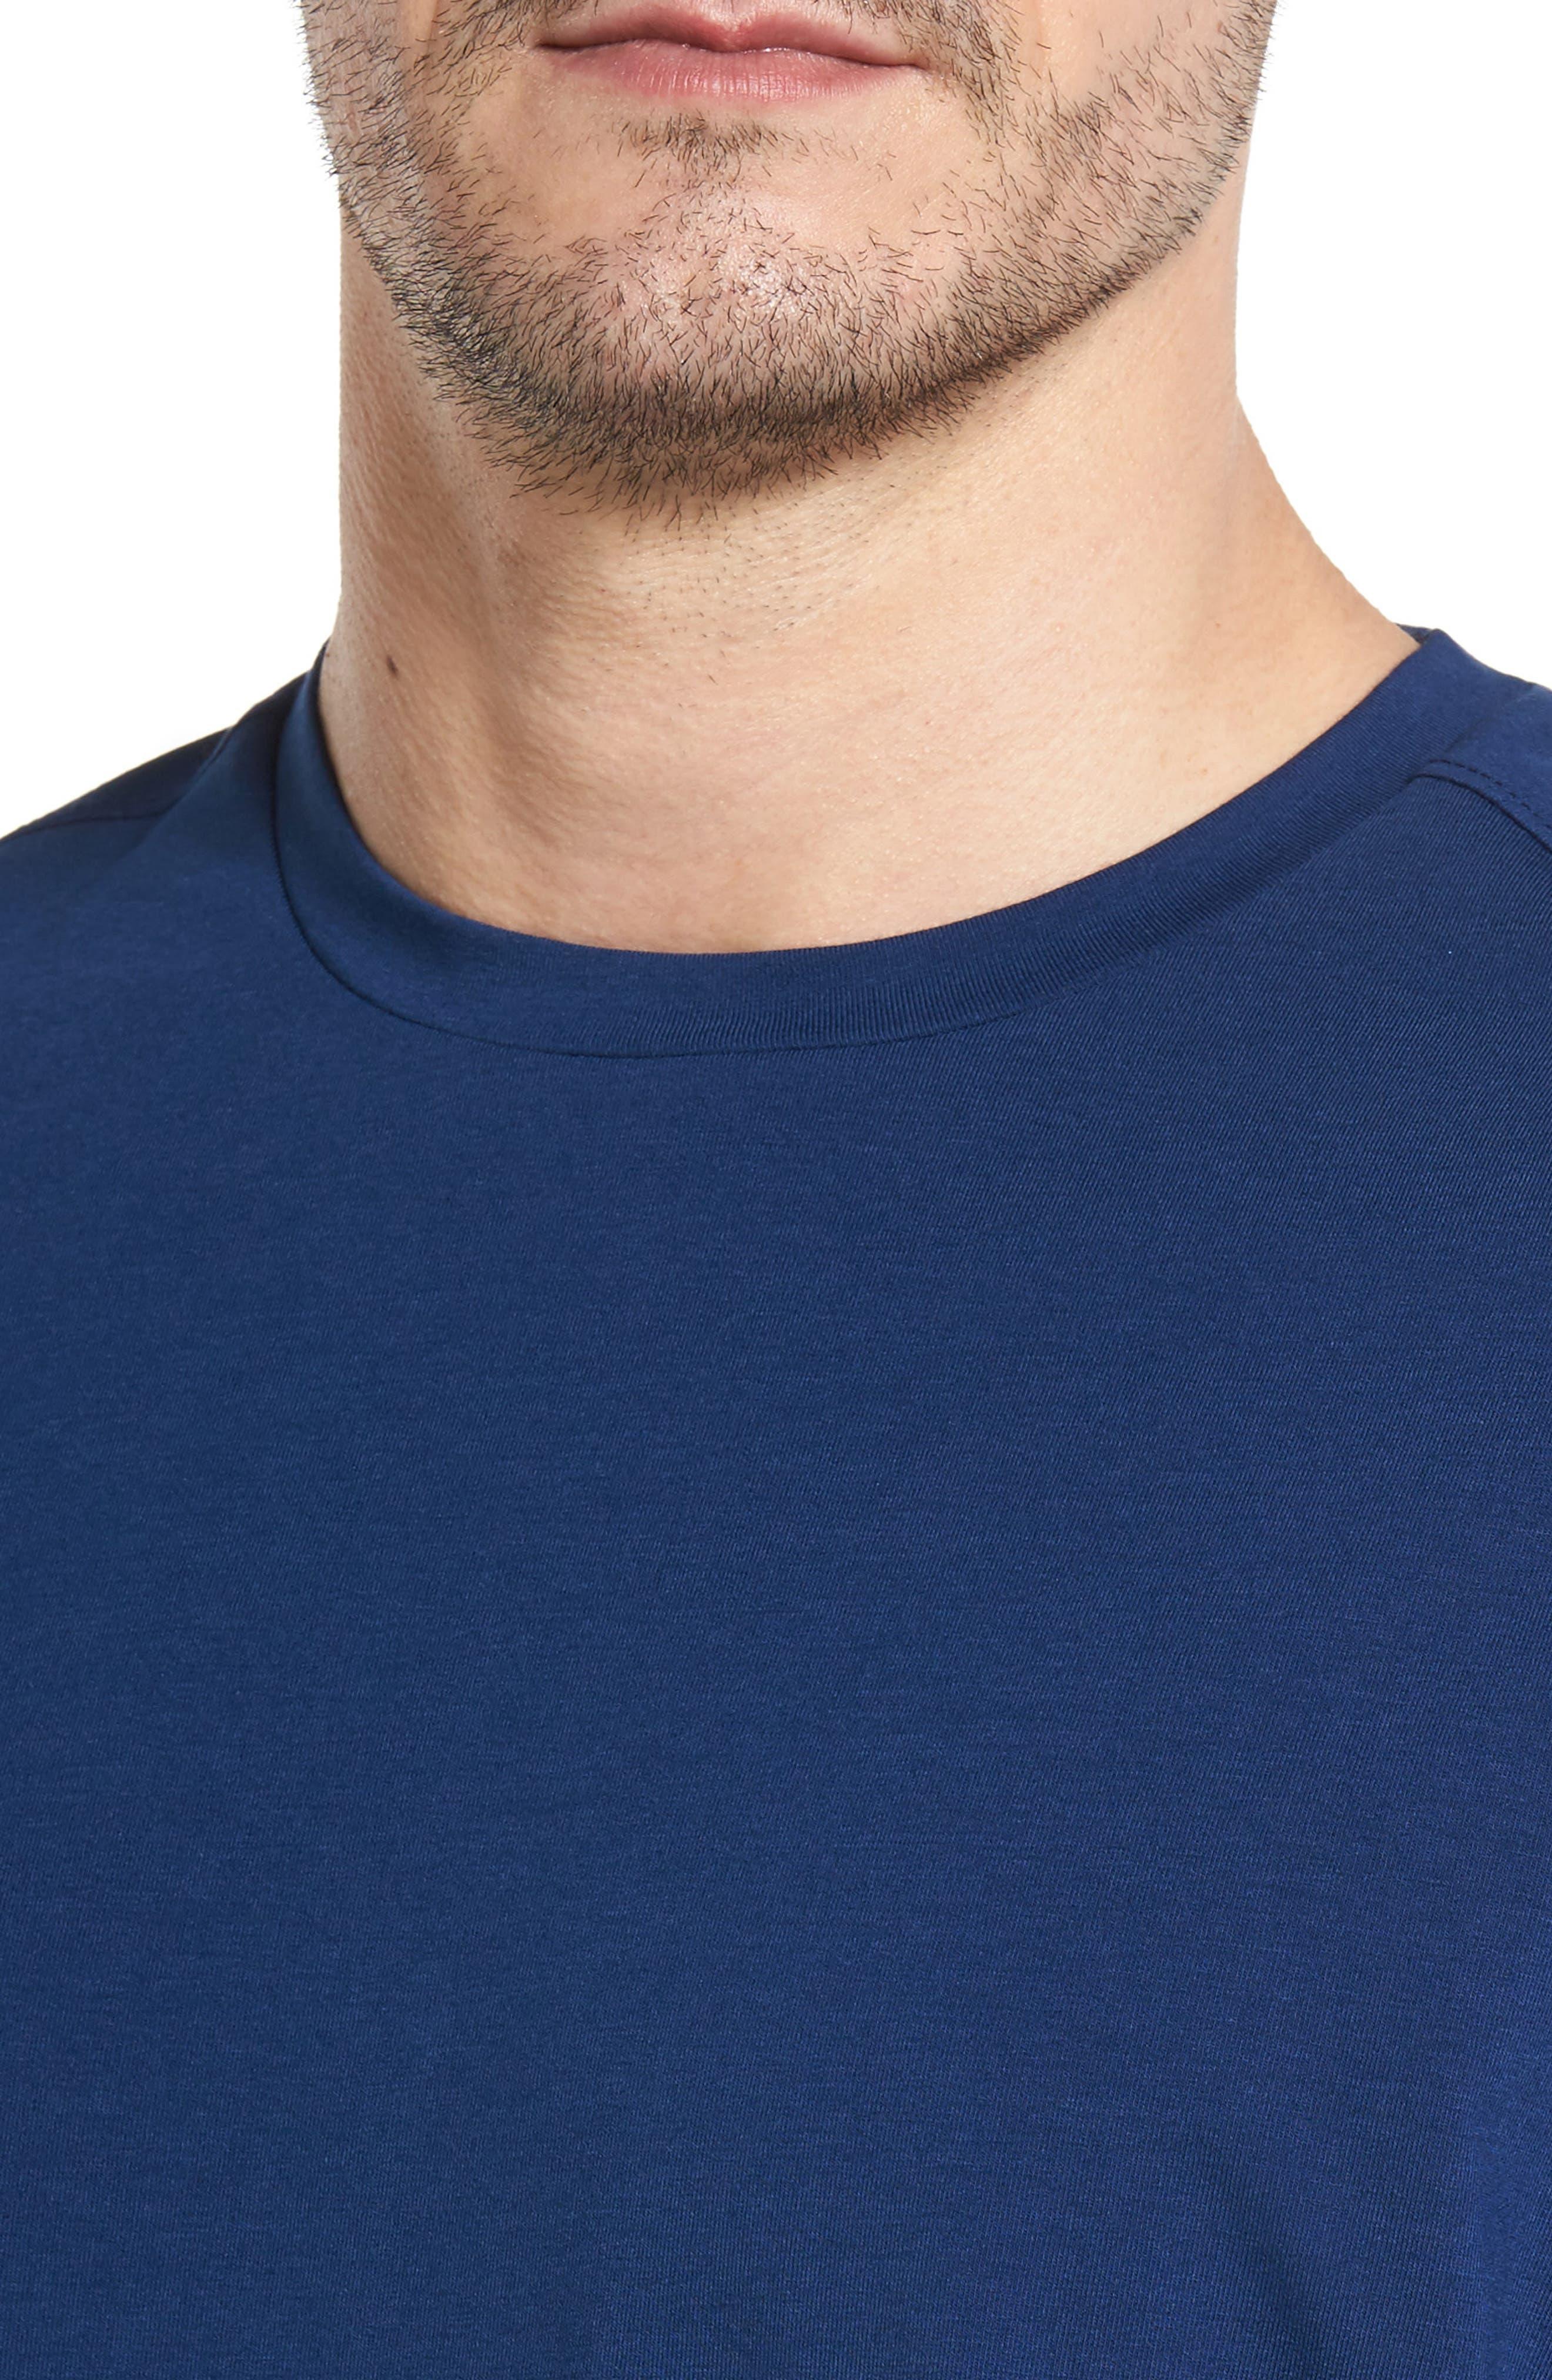 Tropicool T-Shirt,                             Alternate thumbnail 37, color,